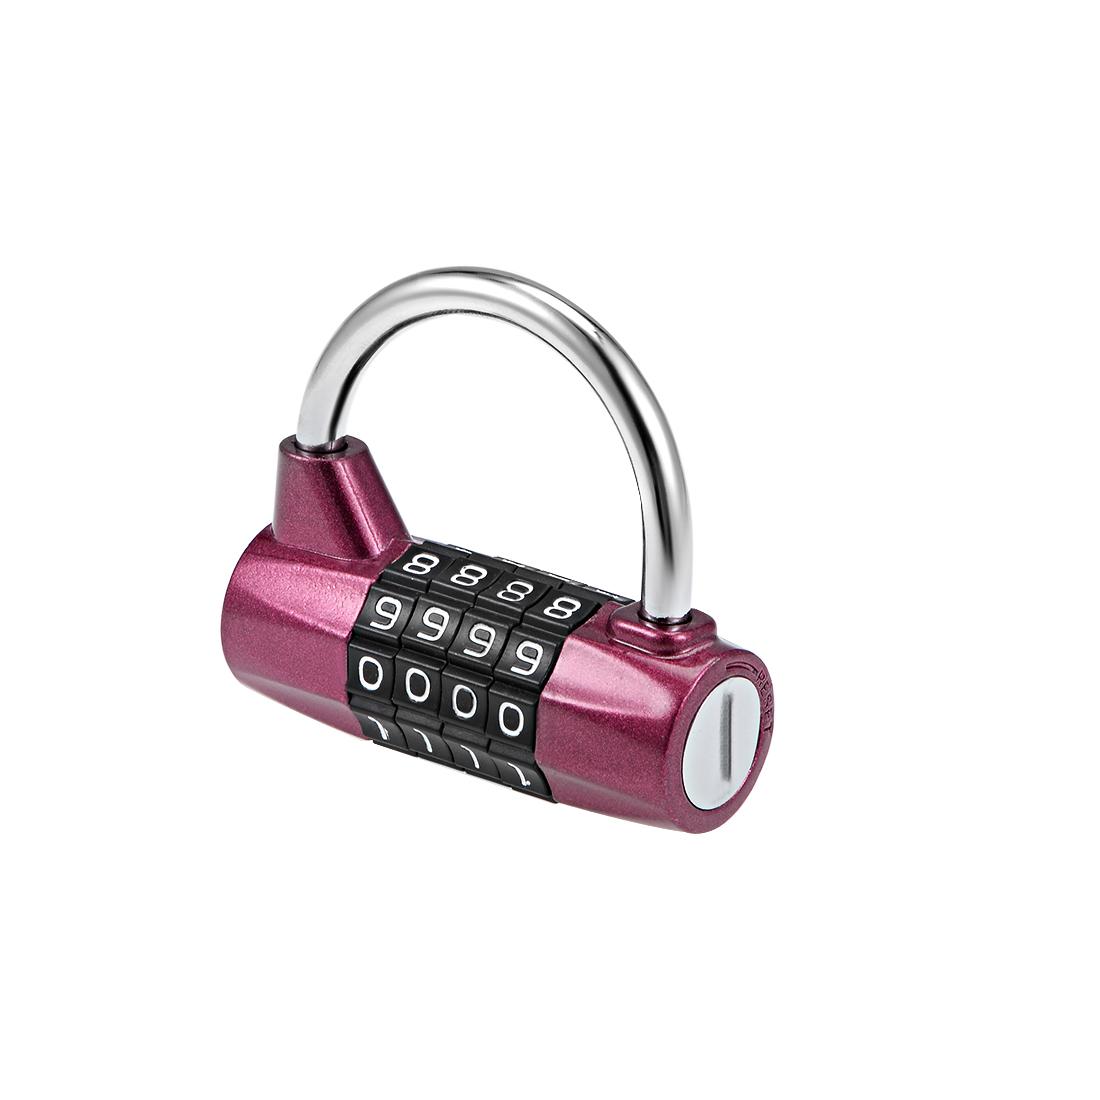 4-Digit Combination Padlock 1/5-inch Shackle Resettable Locker Lock Wine Red